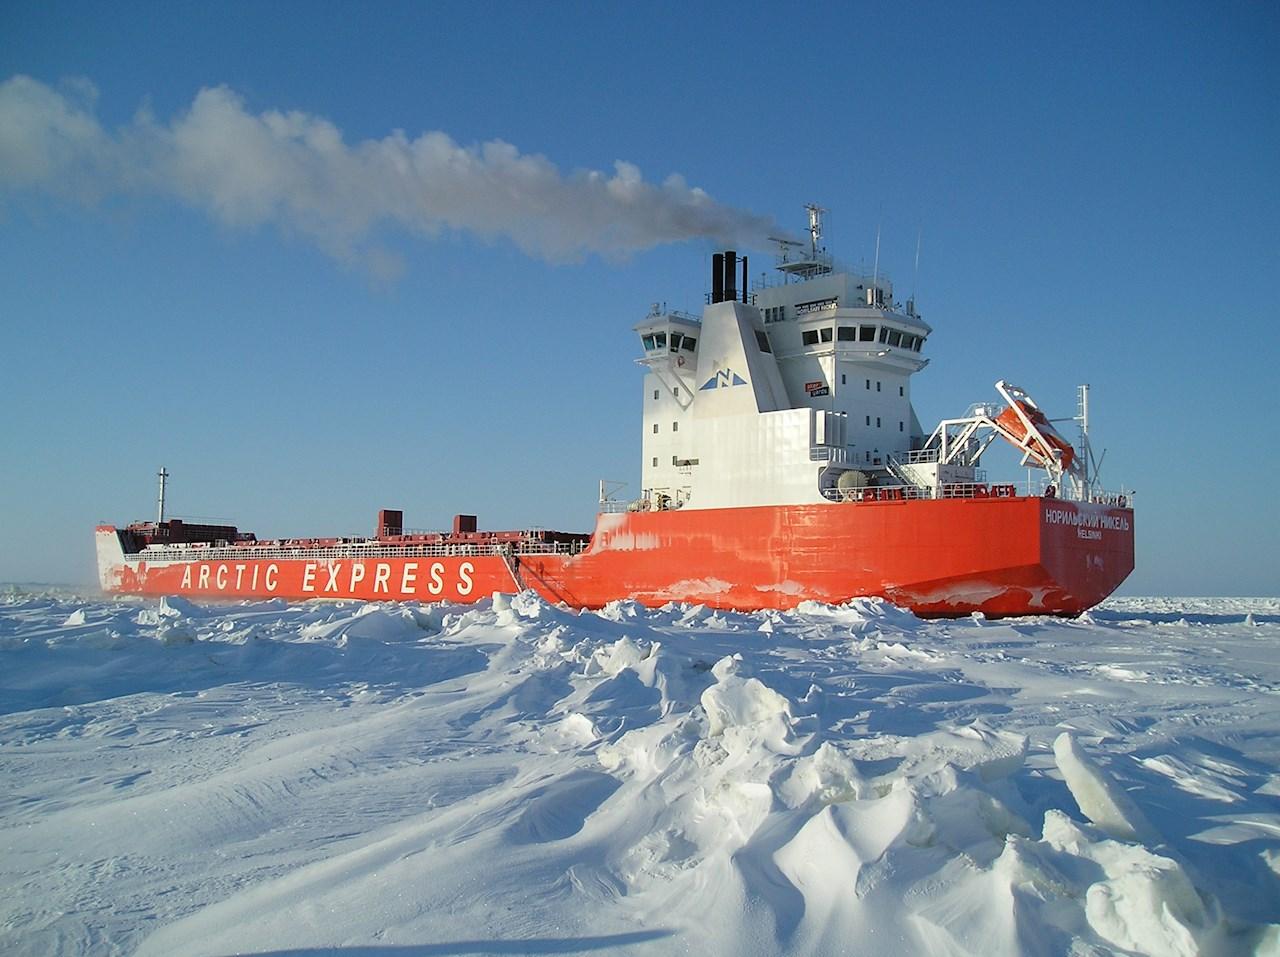 Norilsk Nickel icebreaking ship powered by Azipod® propulsion